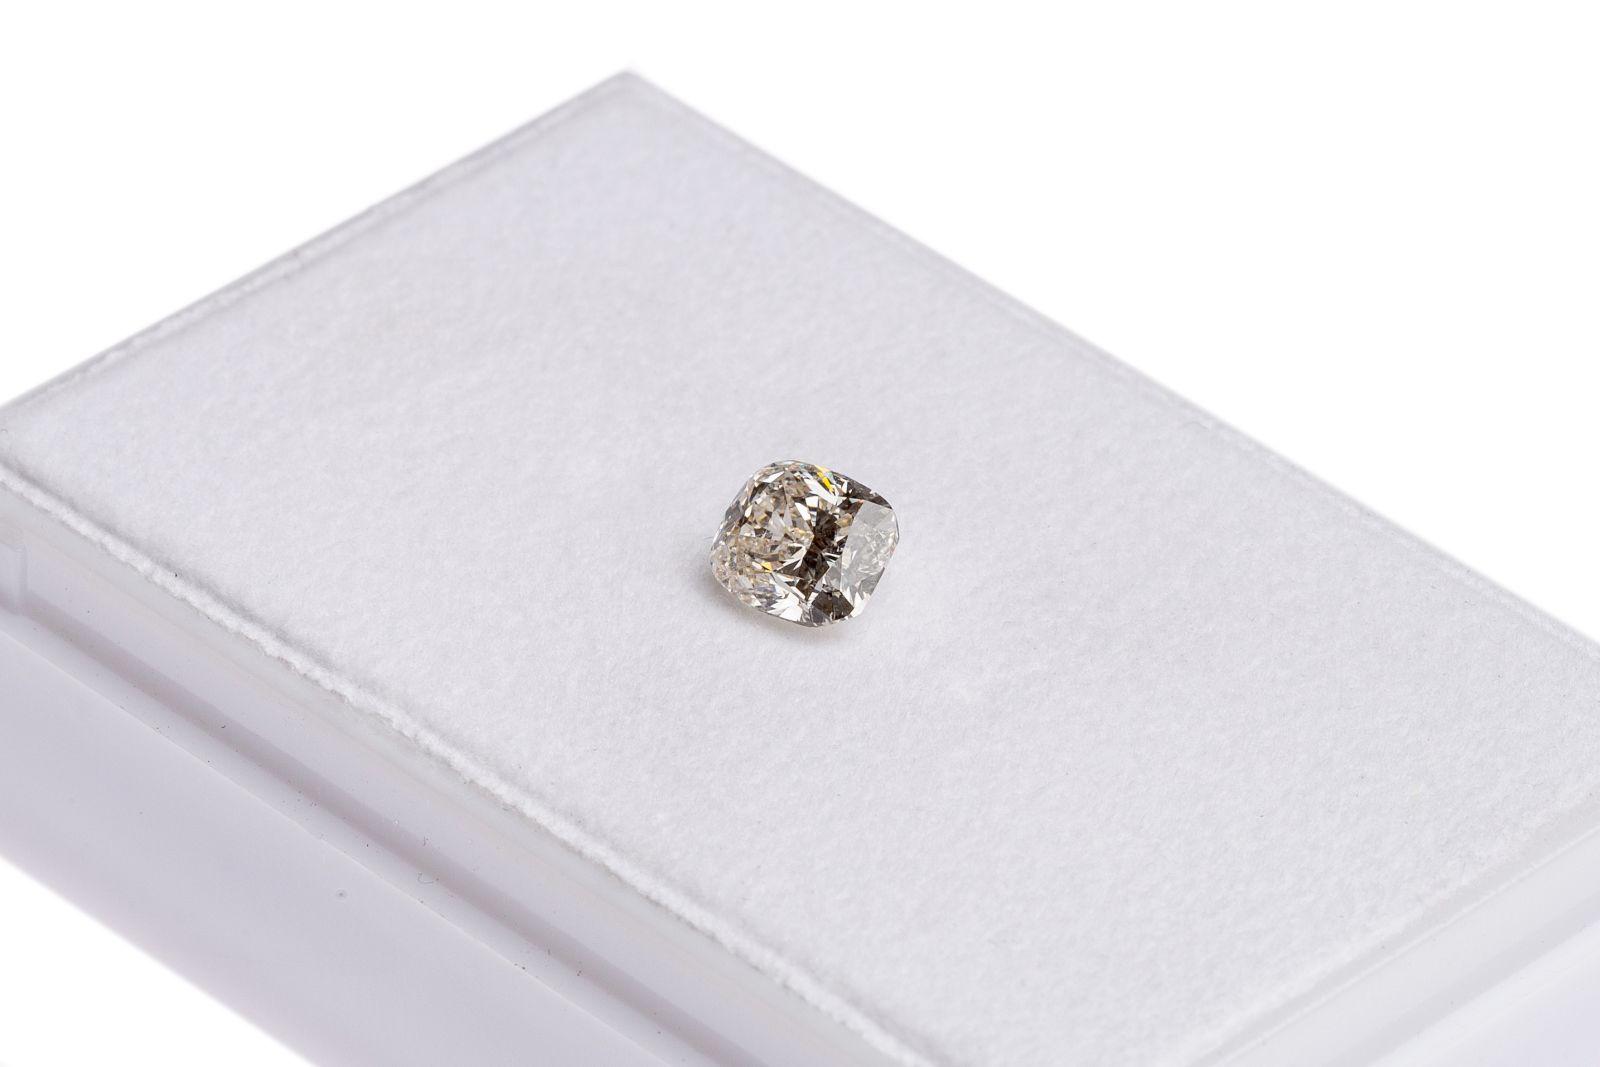 #183 diamond | Loser Diamant Image